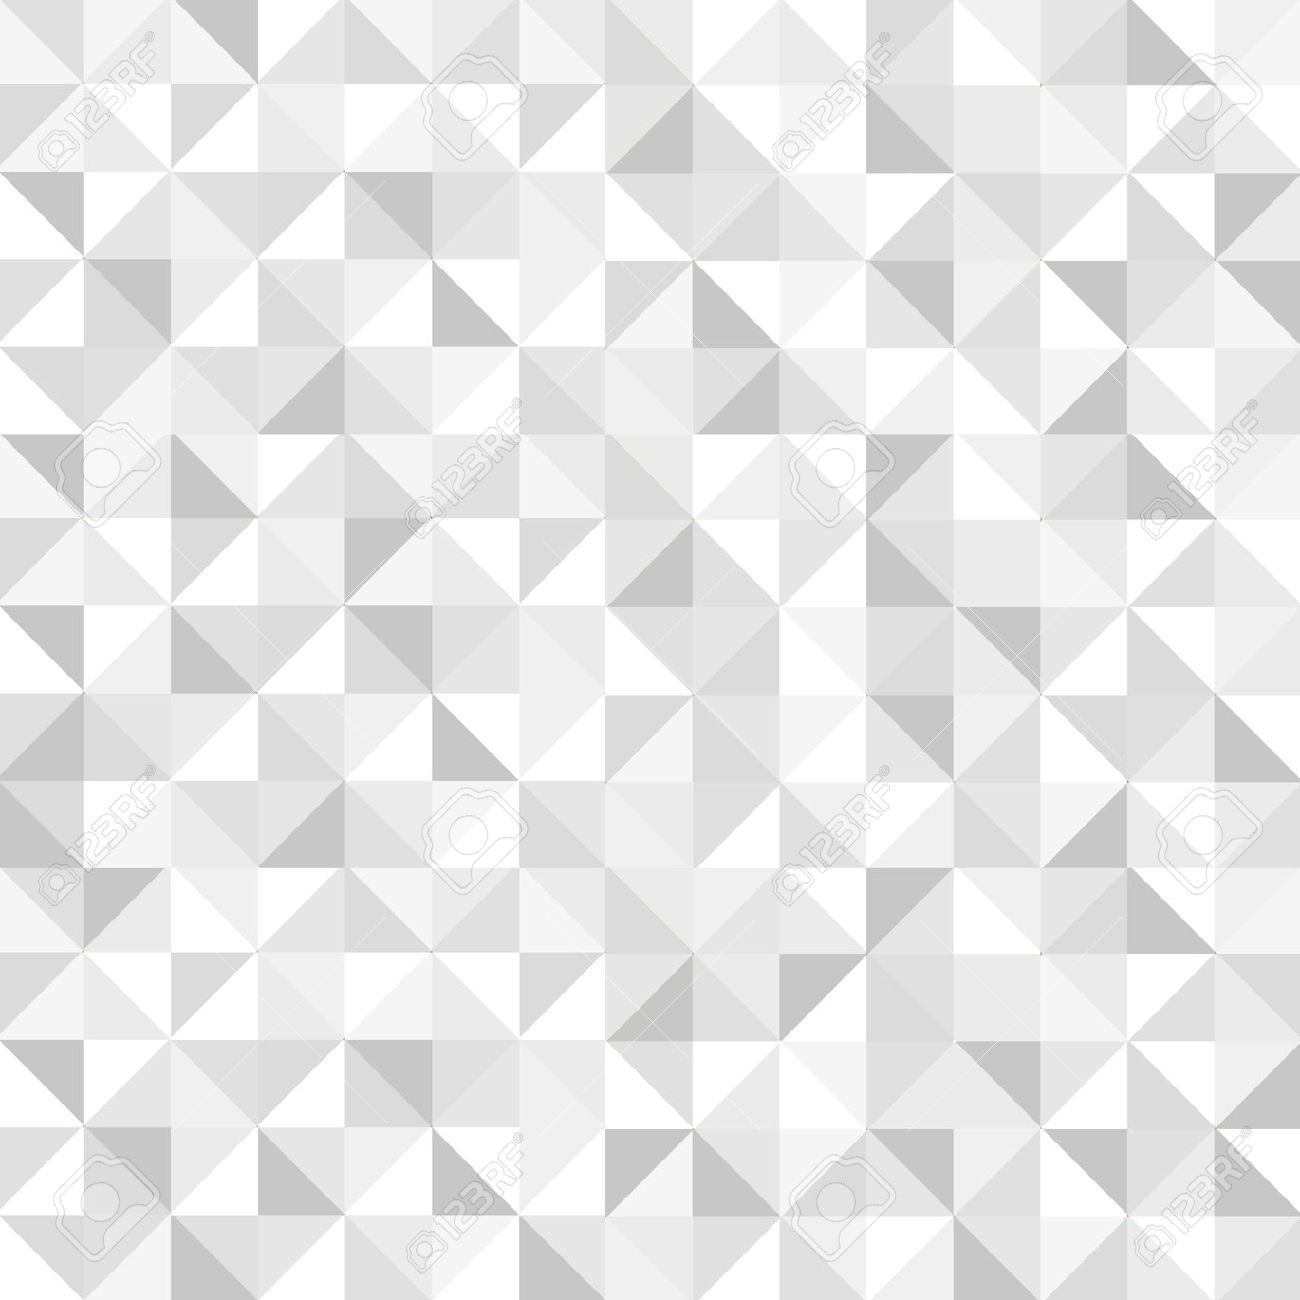 White Geometric Triangle Wallpaper 5 1300x1300